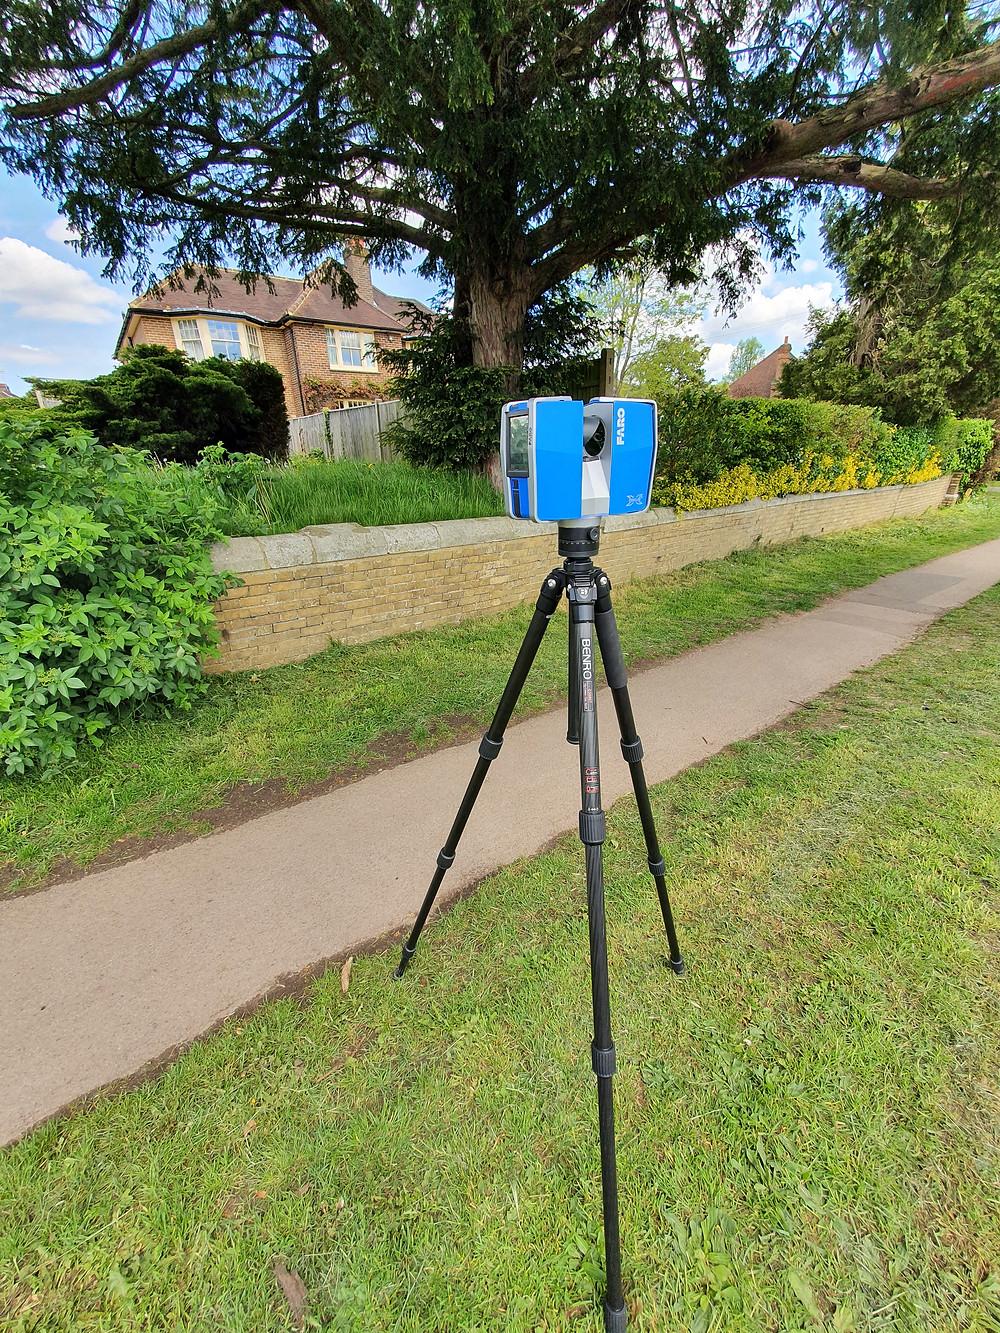 Laser Scanner Faro 330 to measure properties